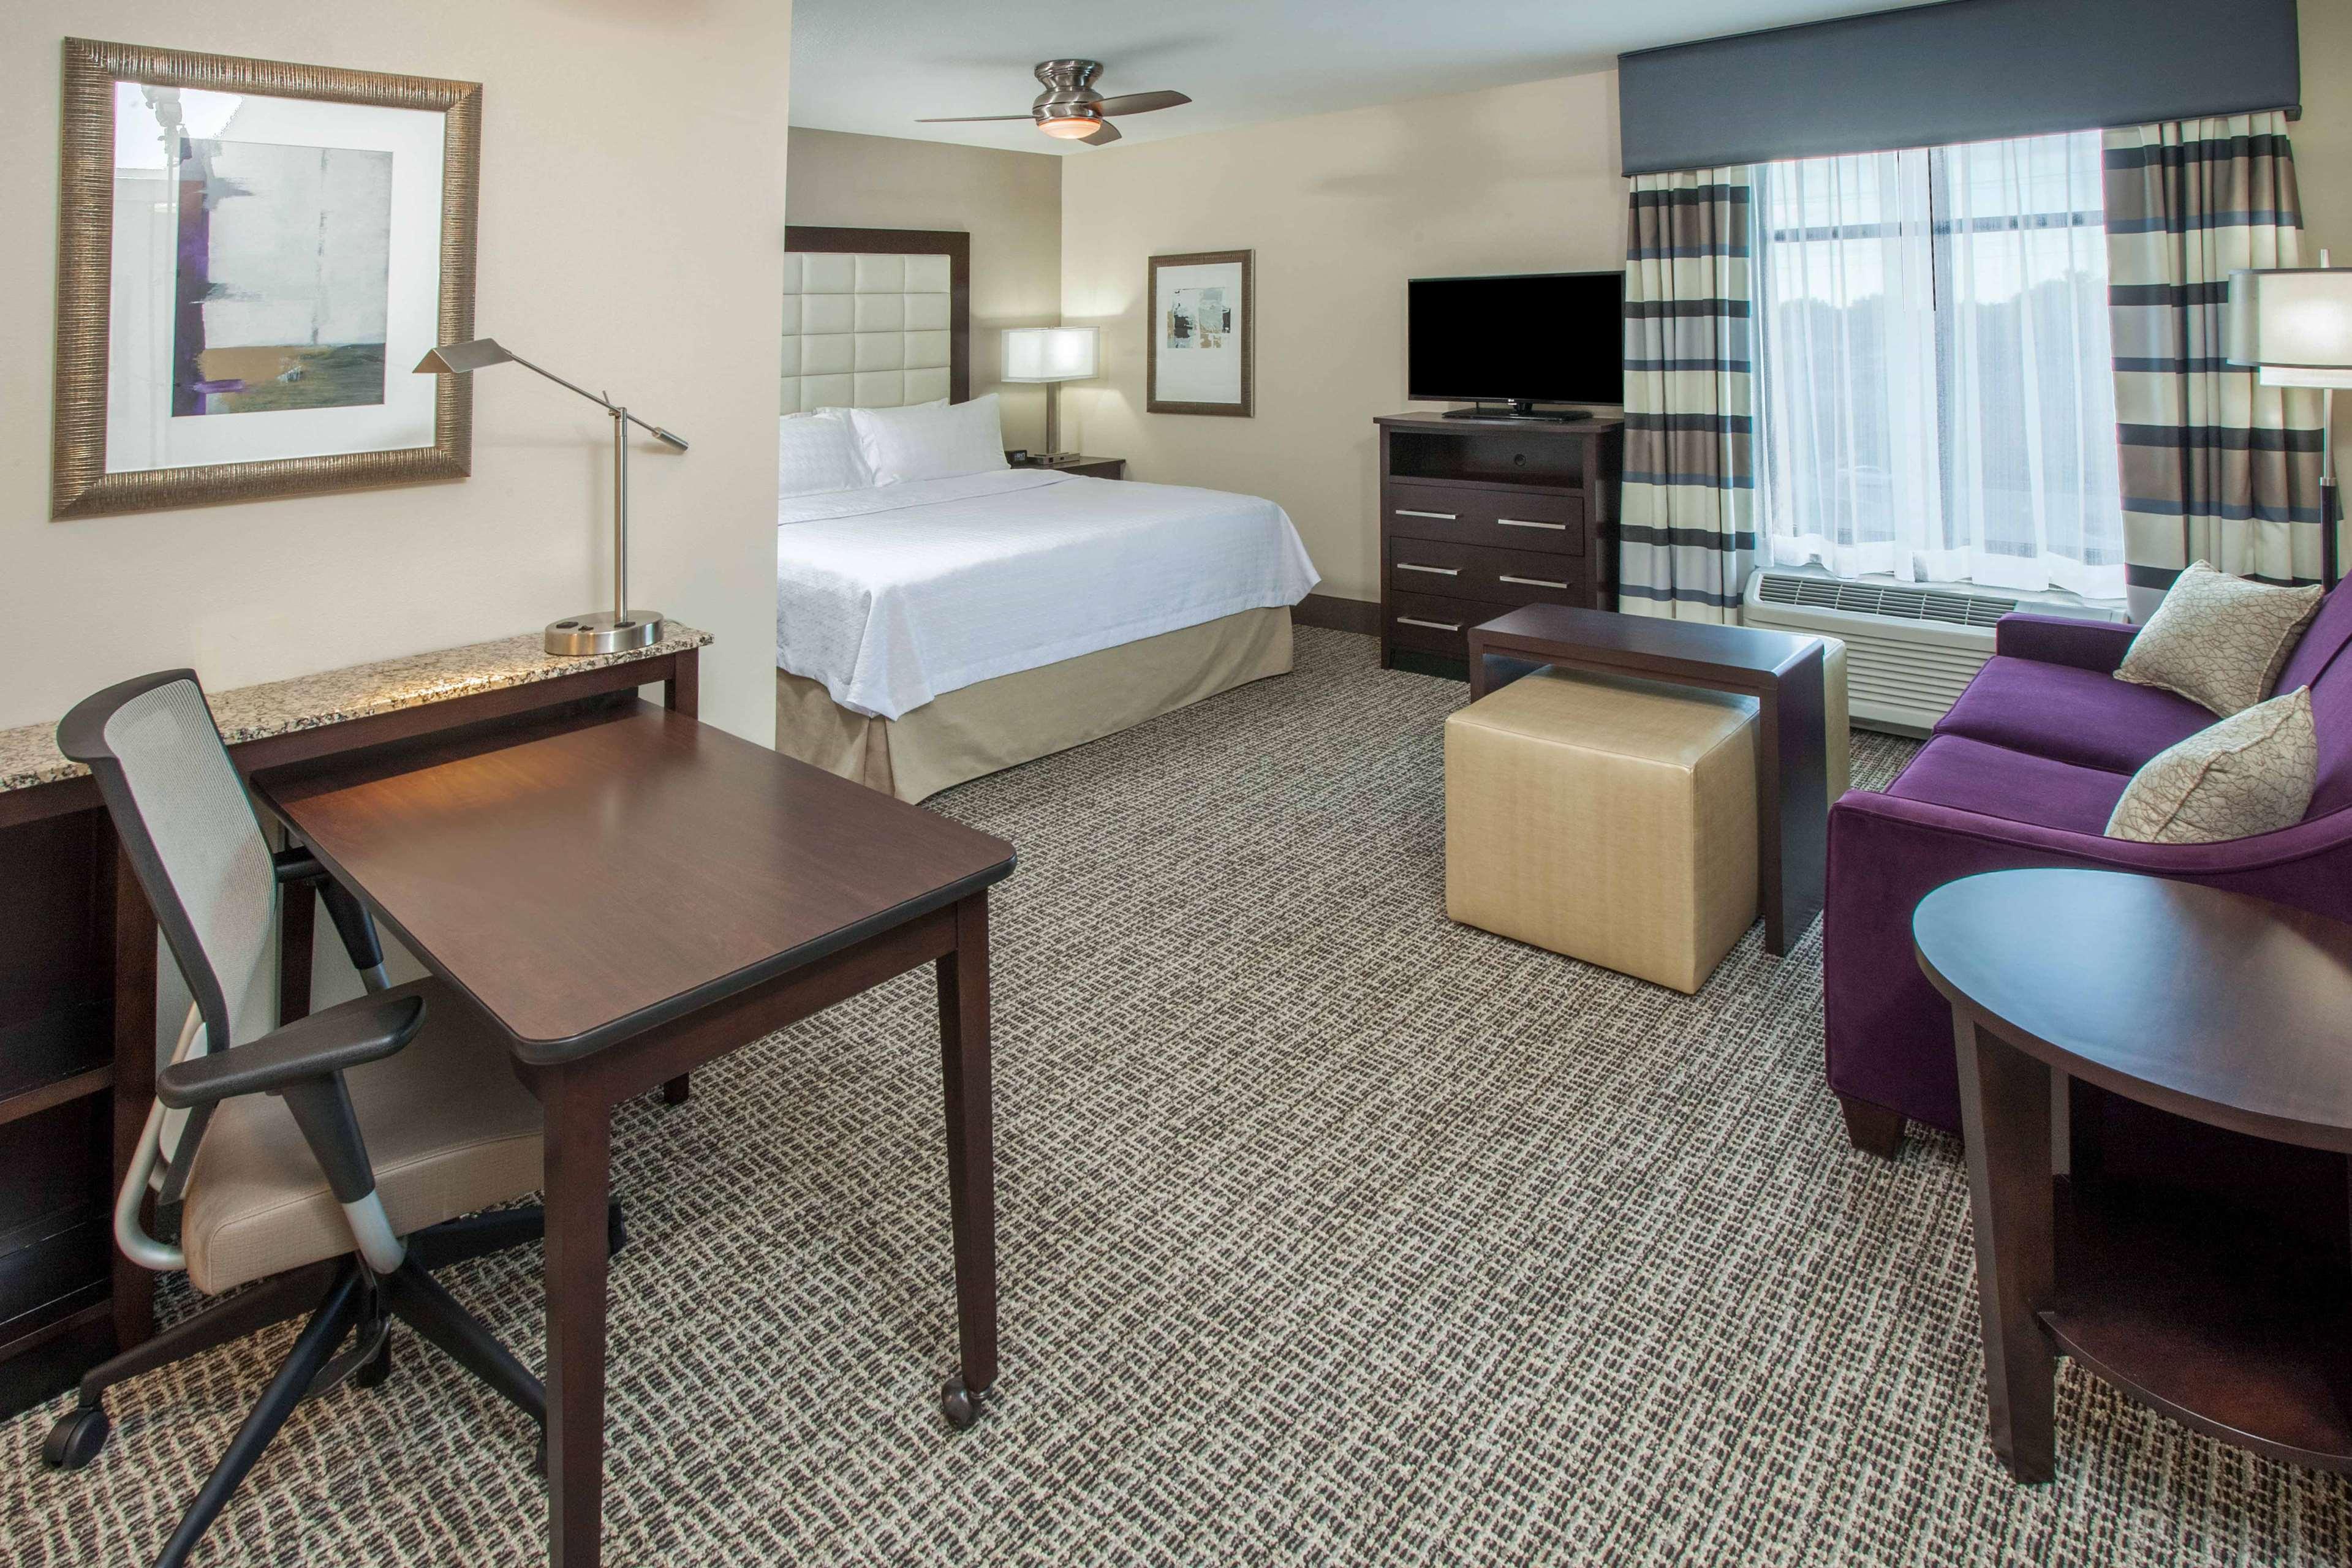 Homewood Suites by Hilton Munster image 5